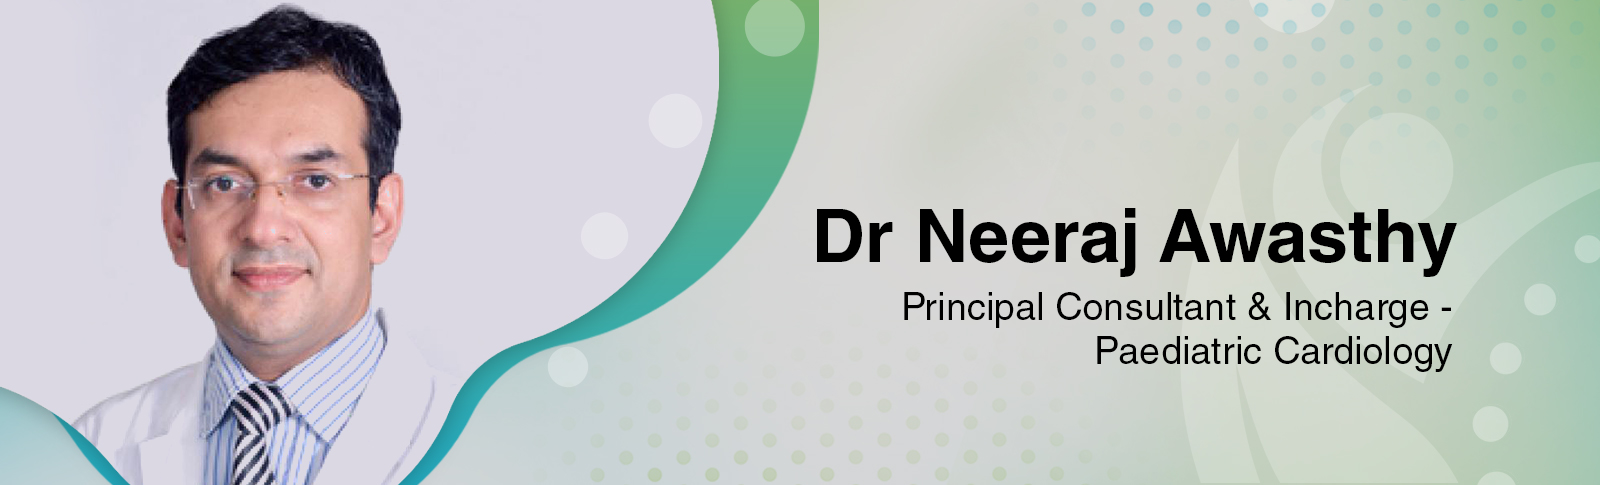 Dr Neeraj Awasthy